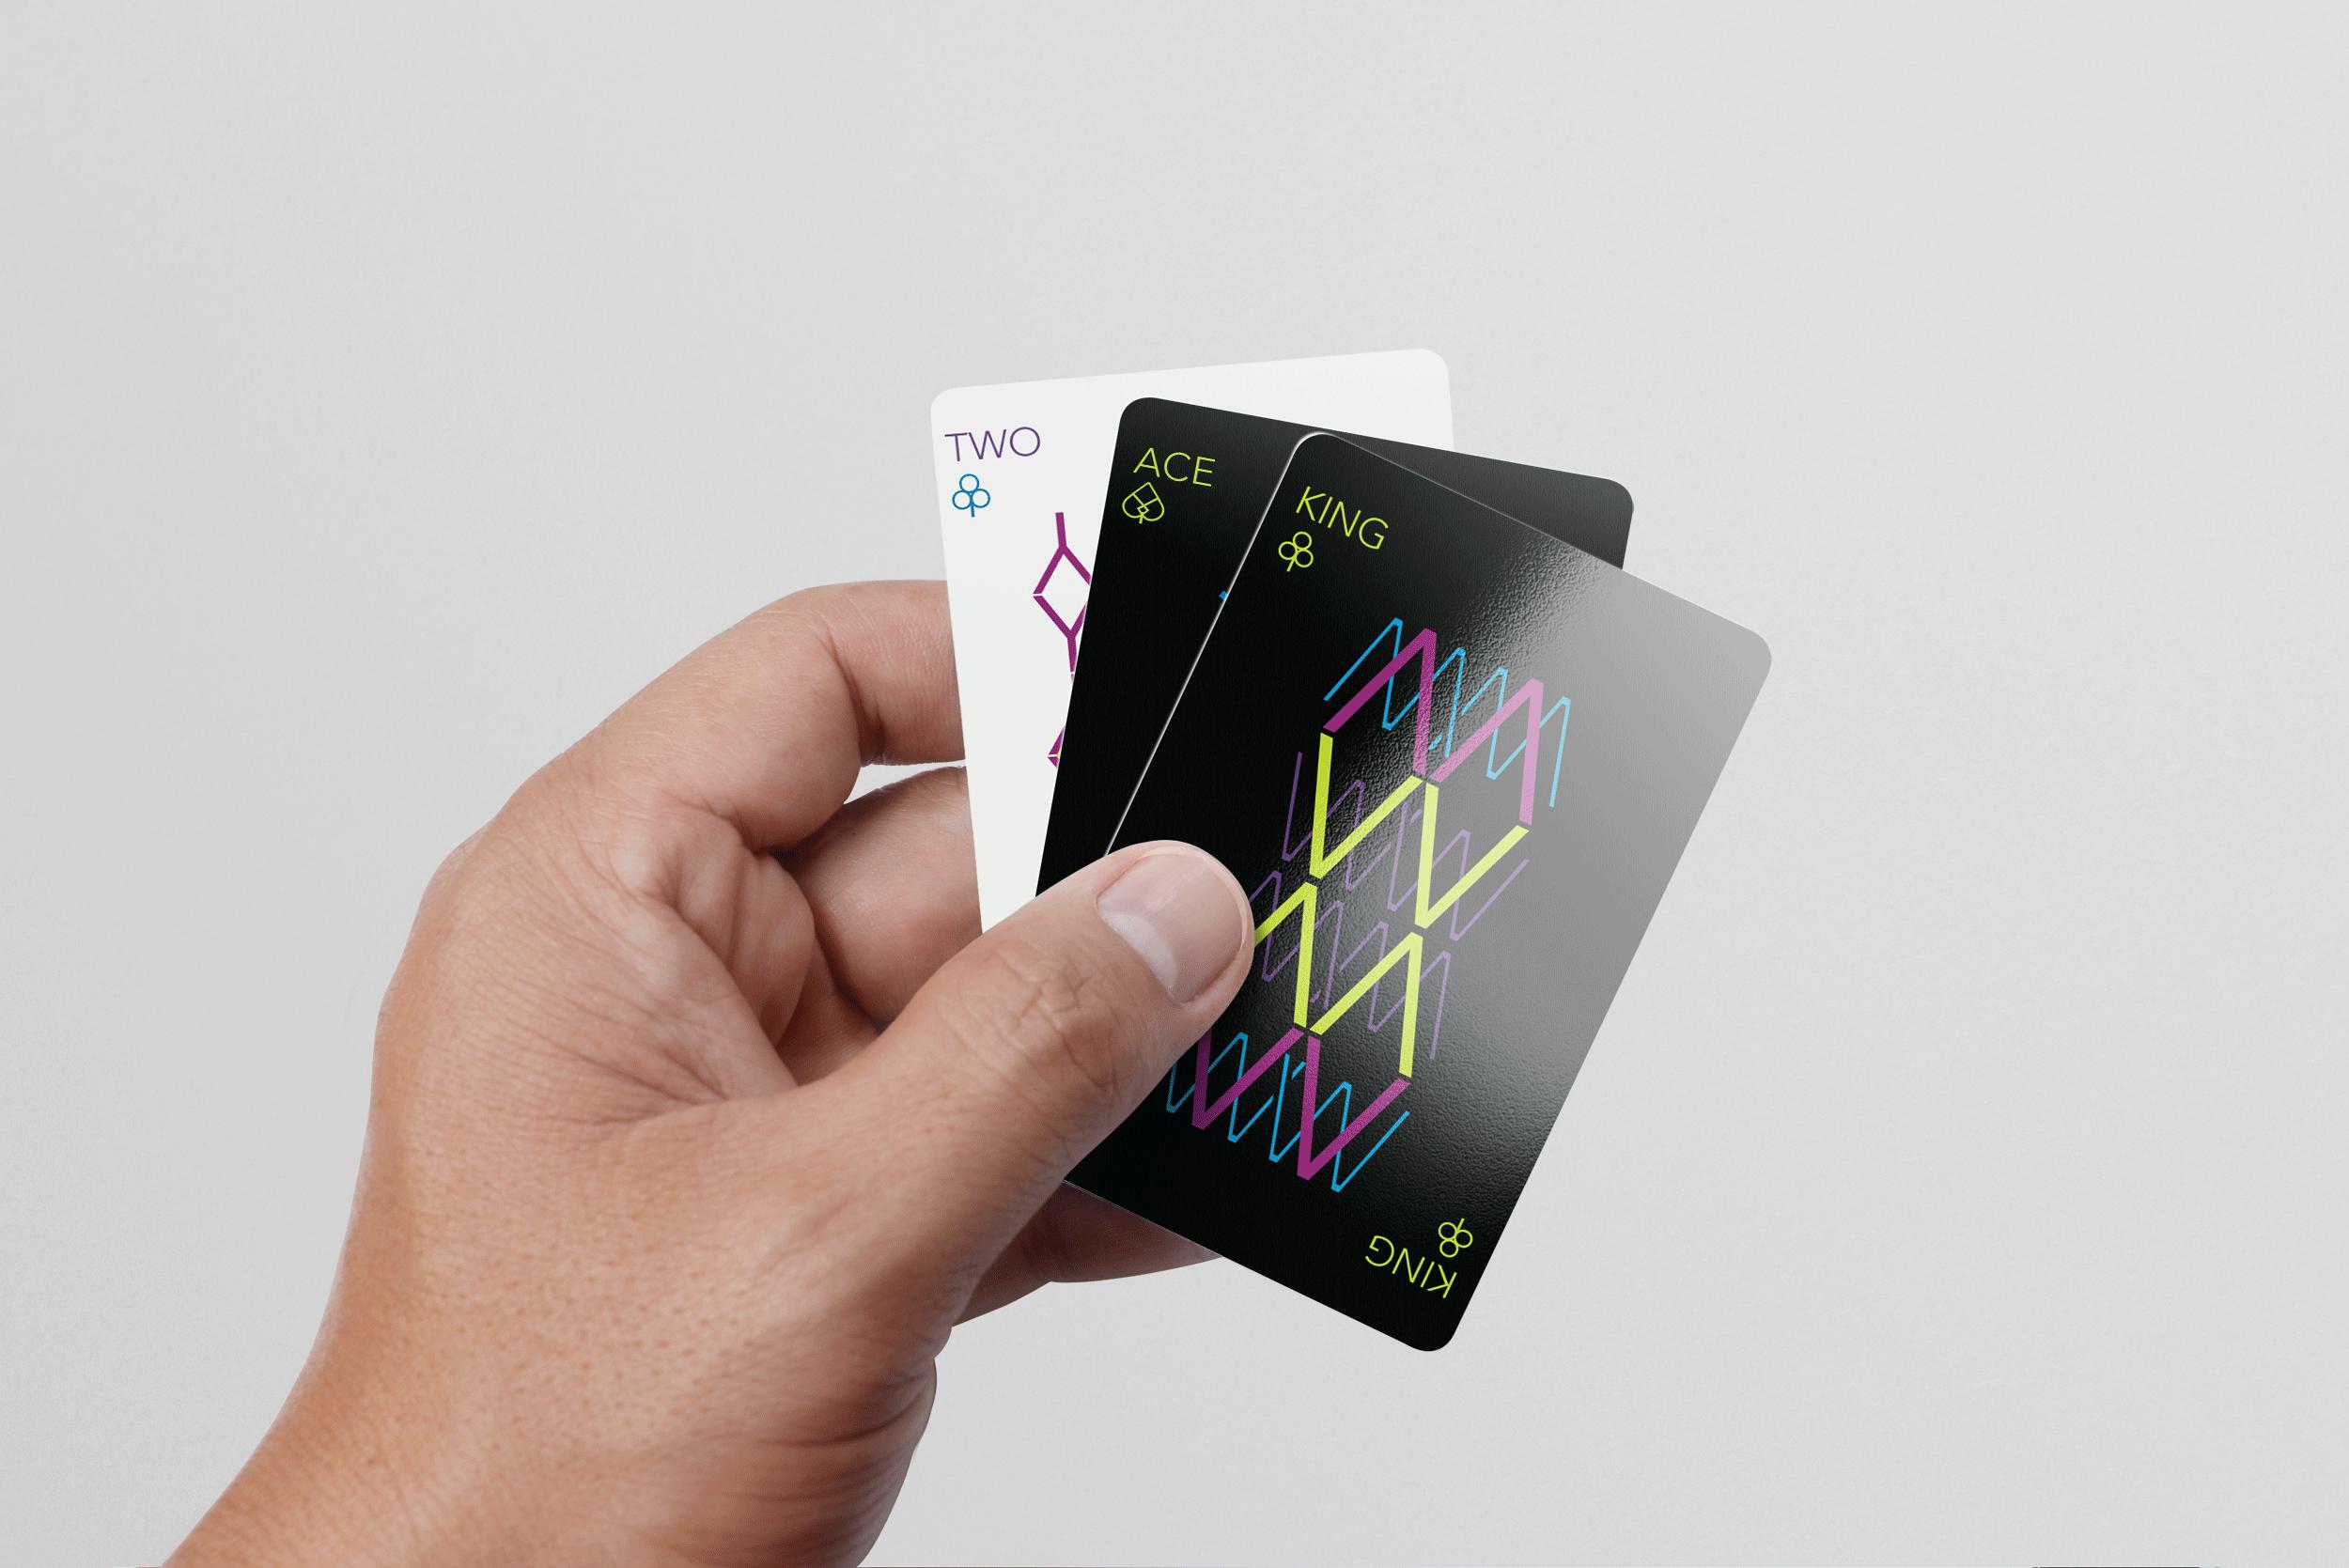 bg_avenir_playing_cards1.png